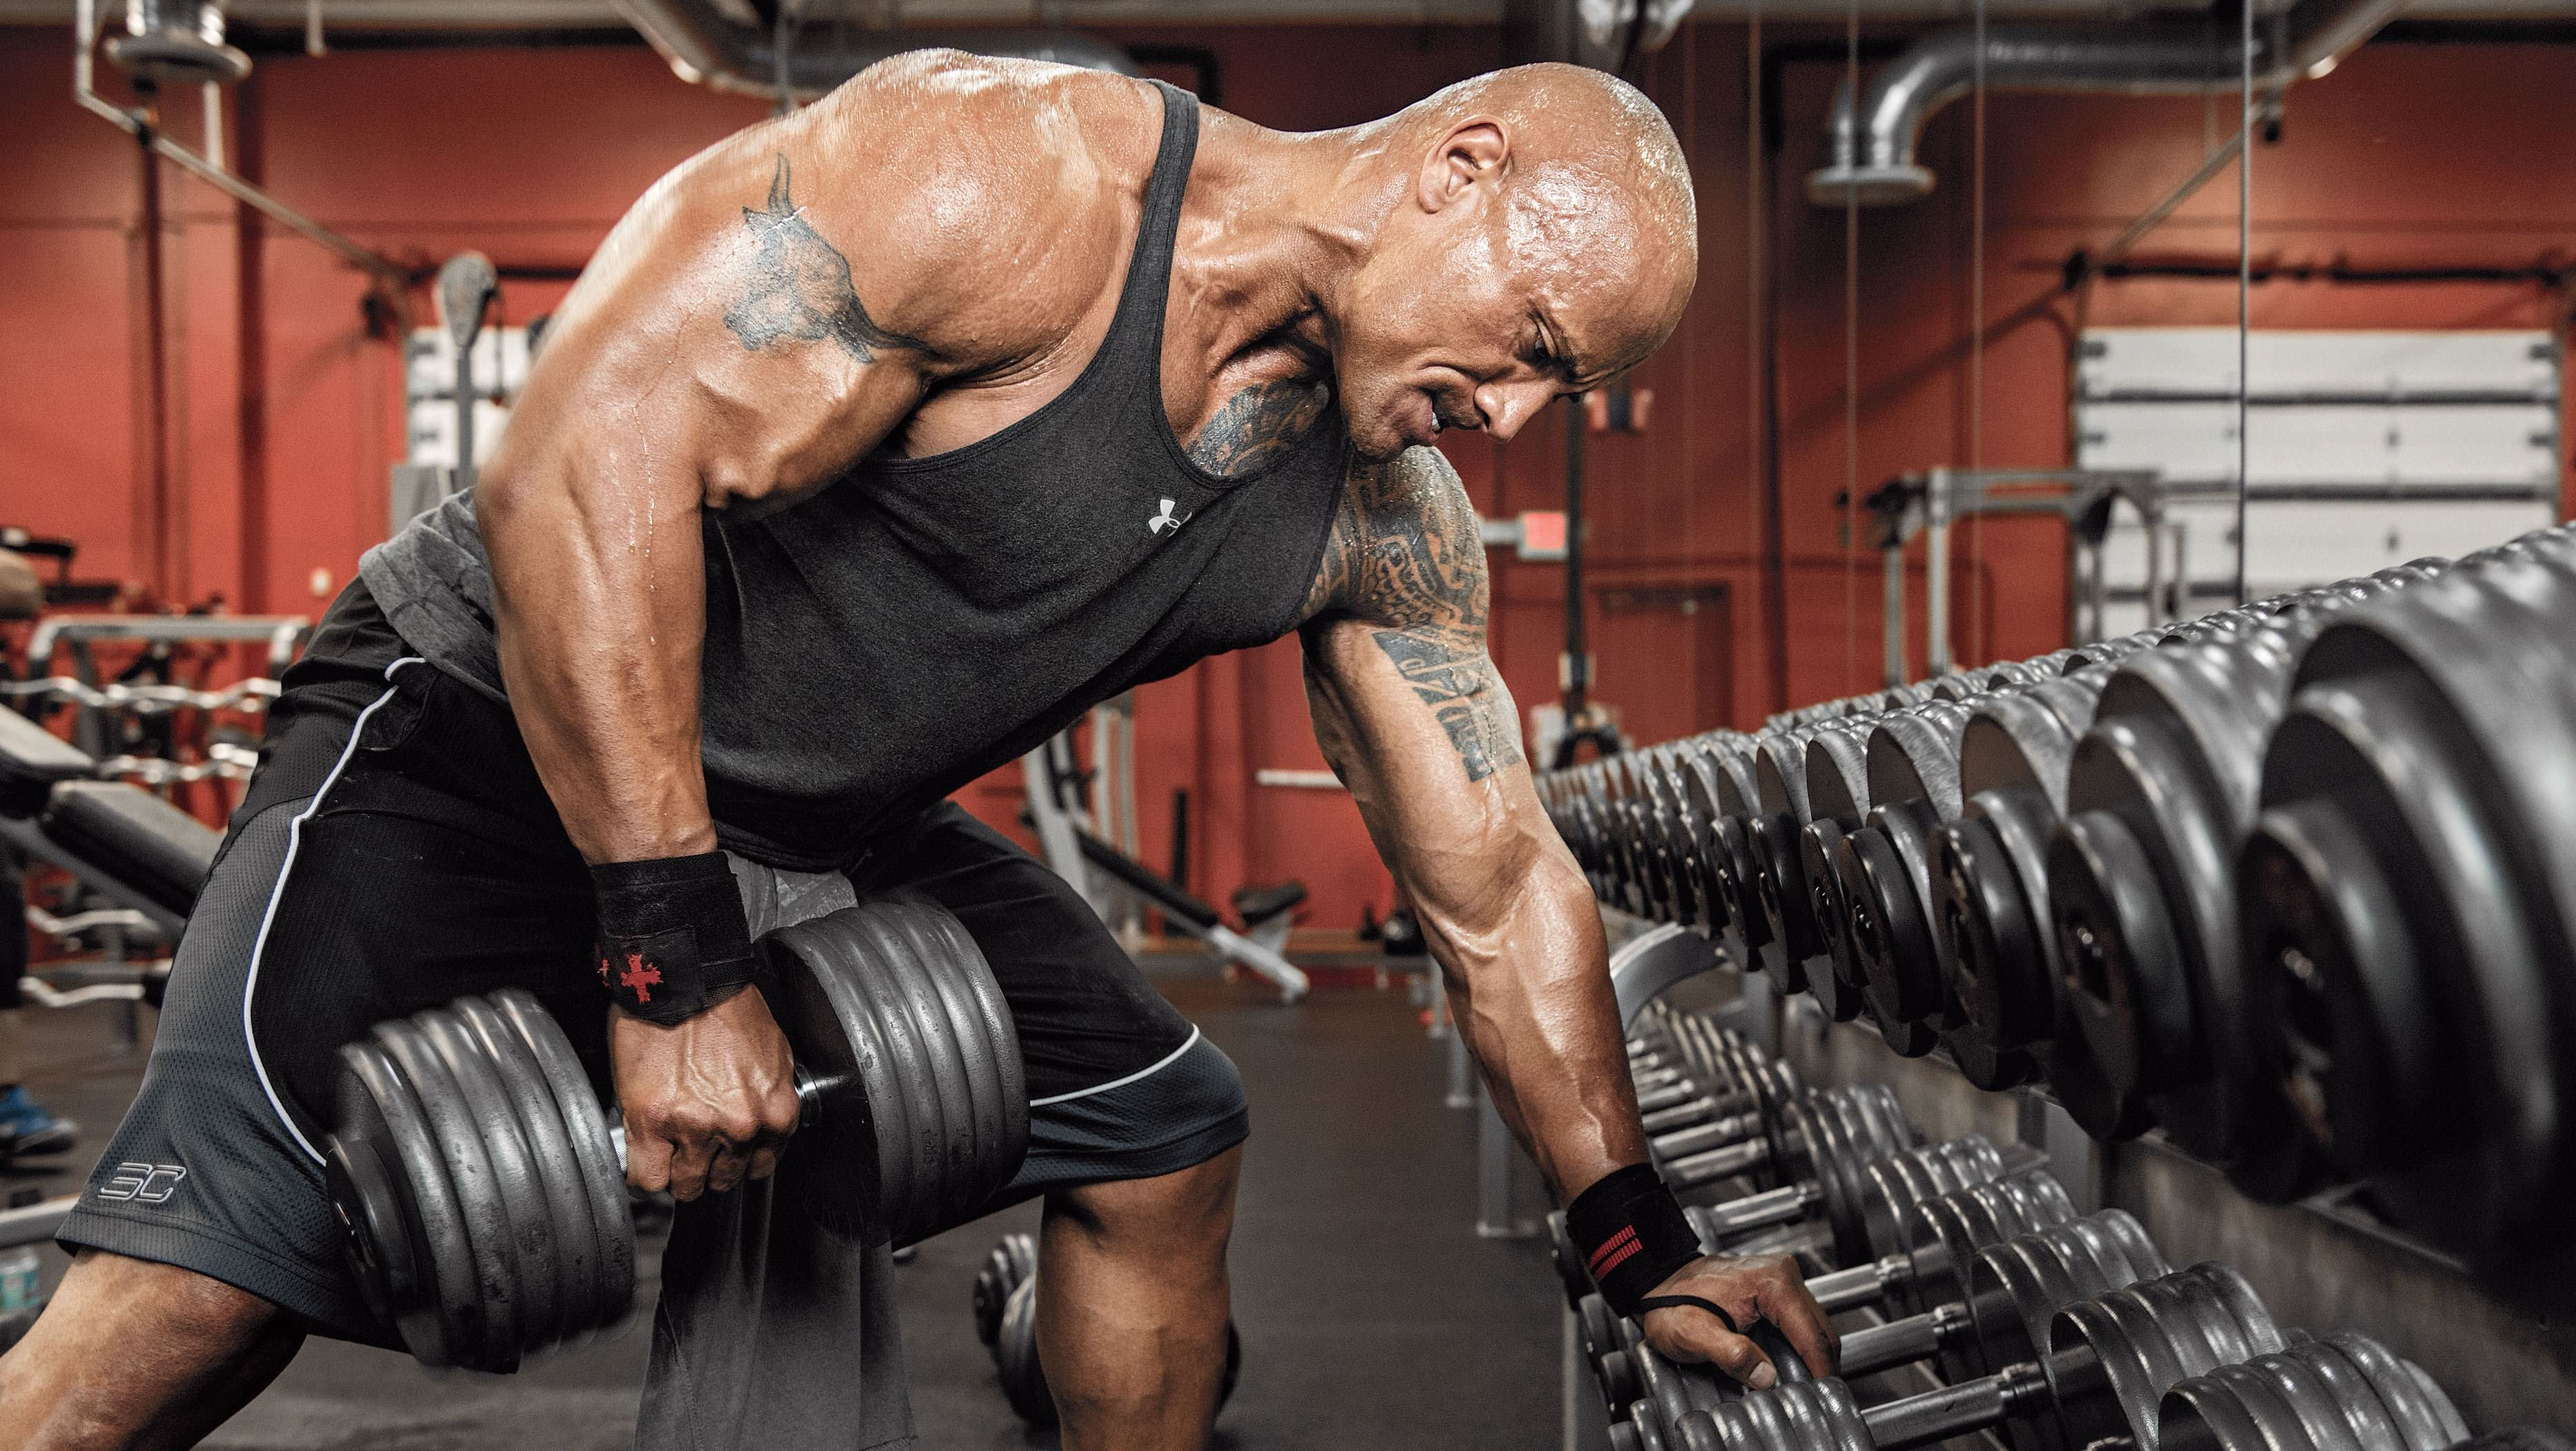 dwayne johnson lifting weights 4k wallpaper 2221